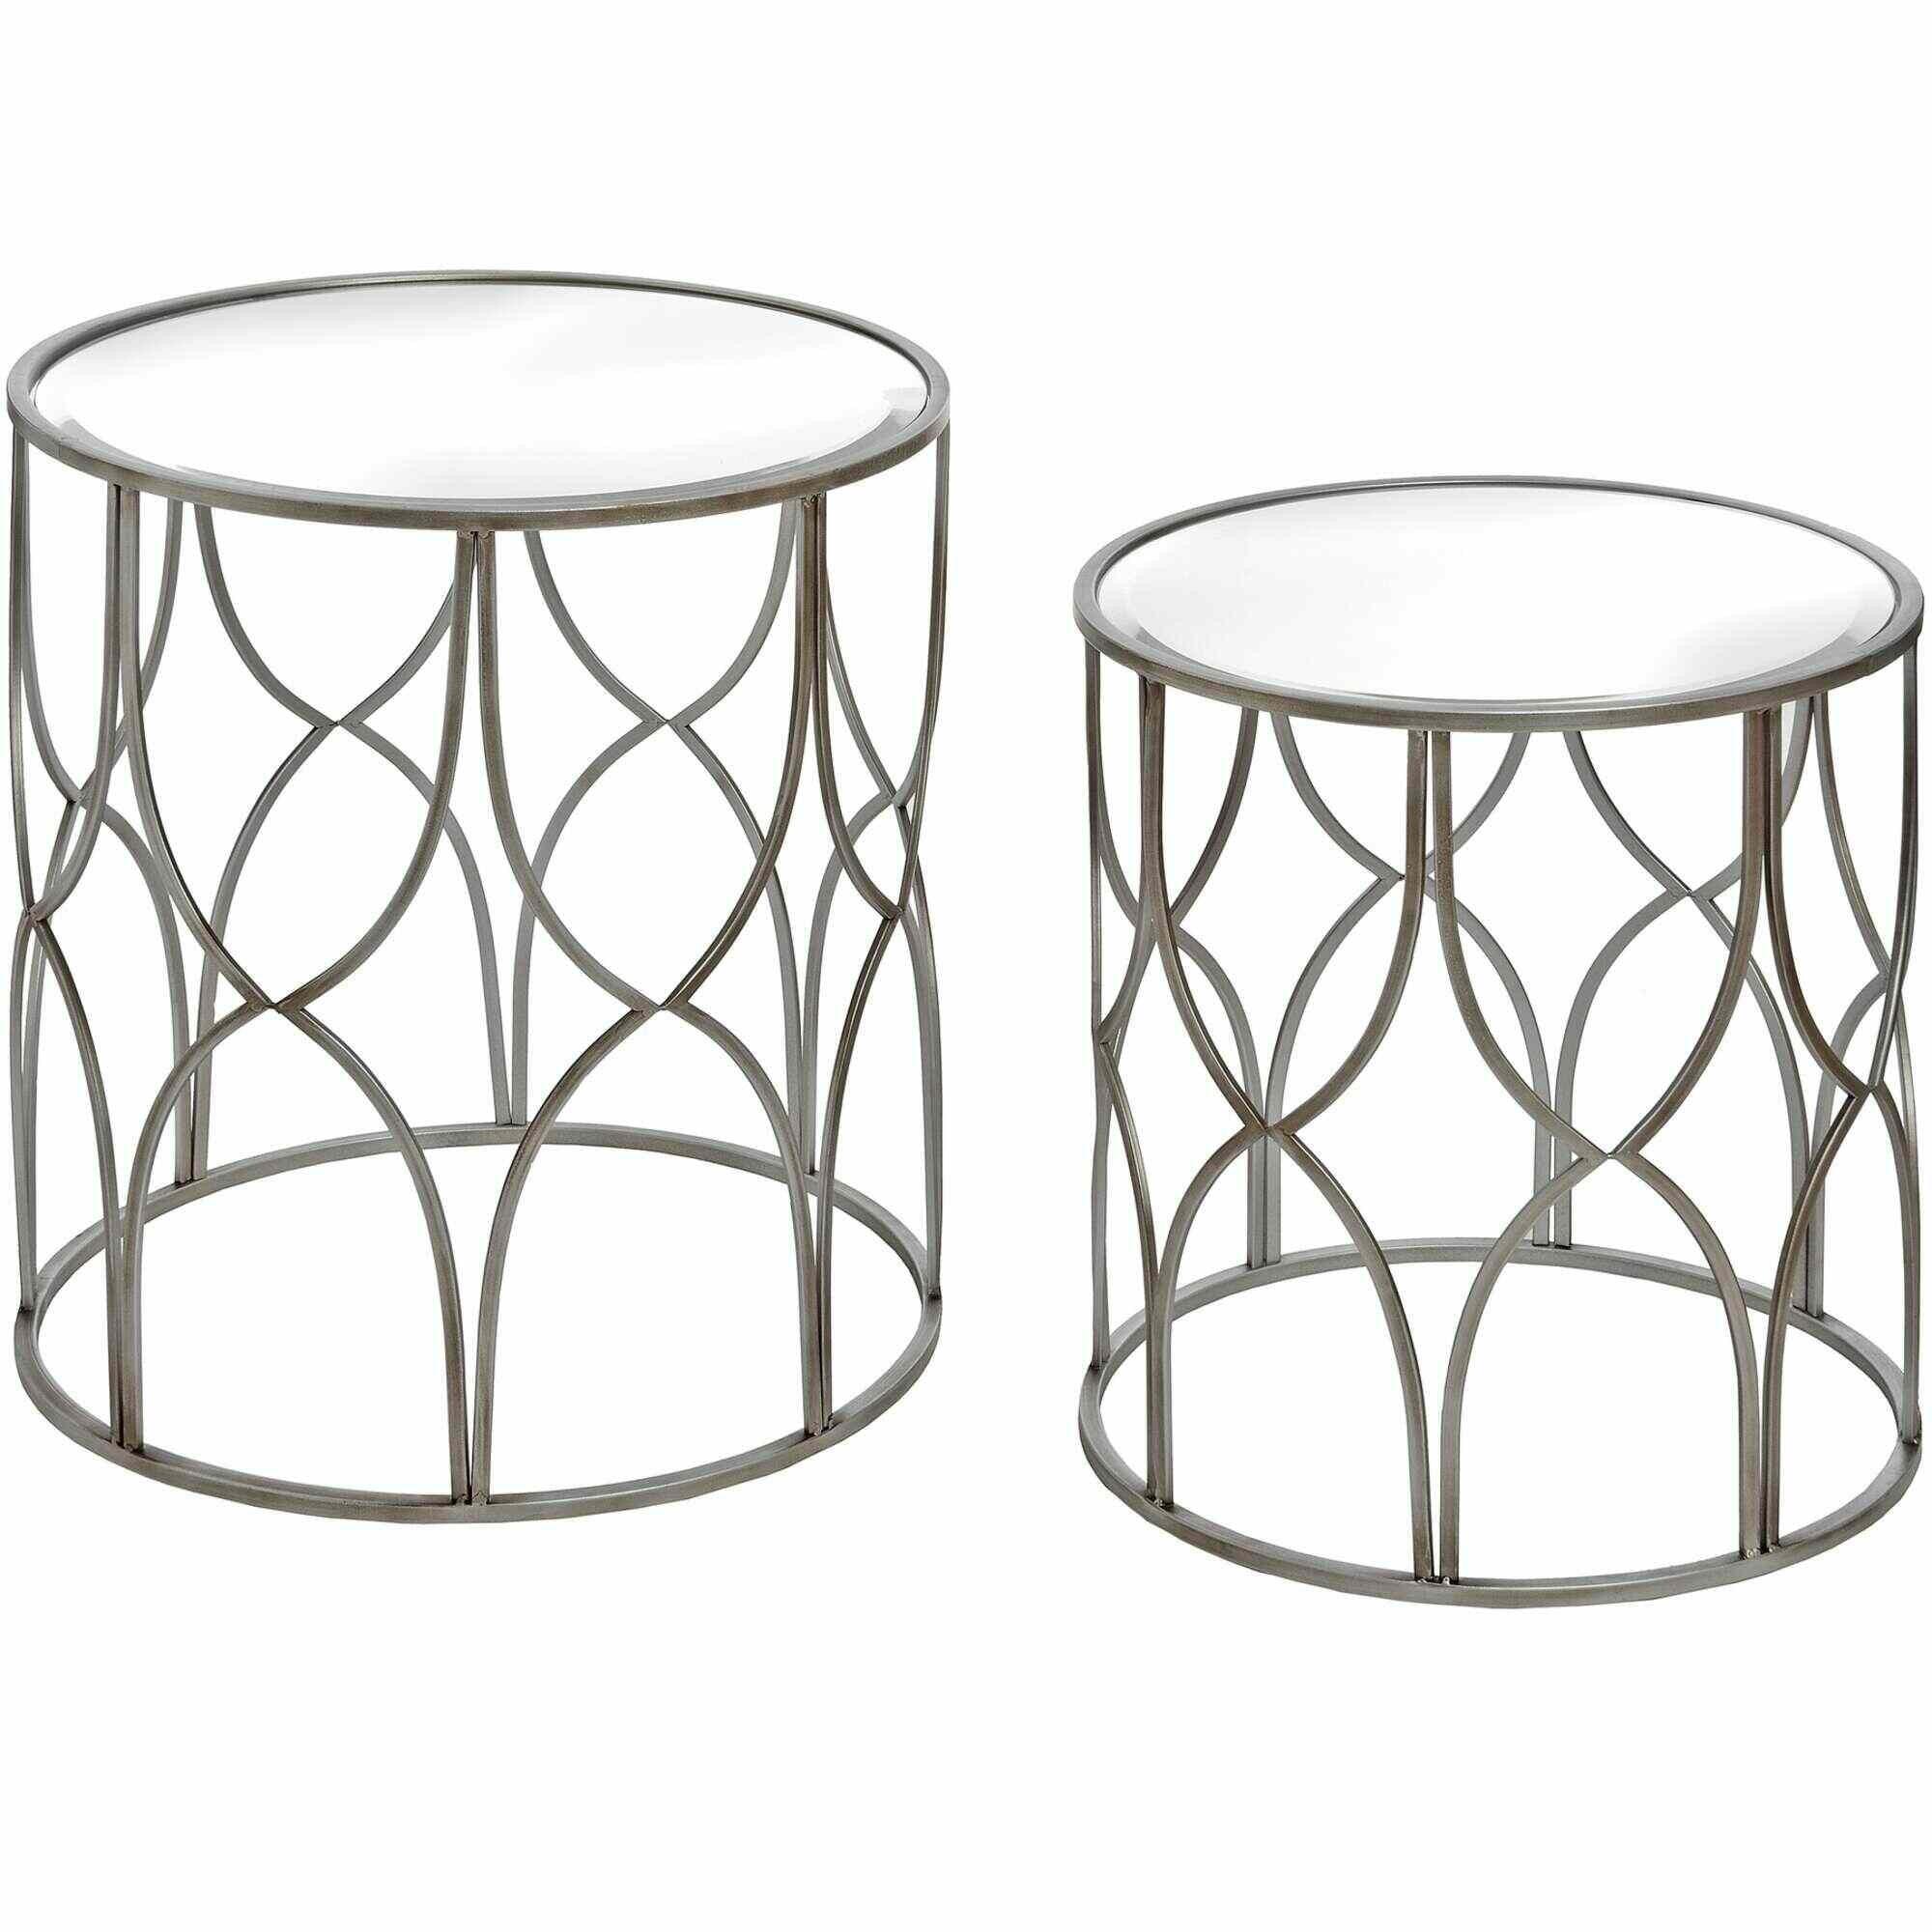 Sidetable Met La.Lattice Detail Silver Metal Side Table